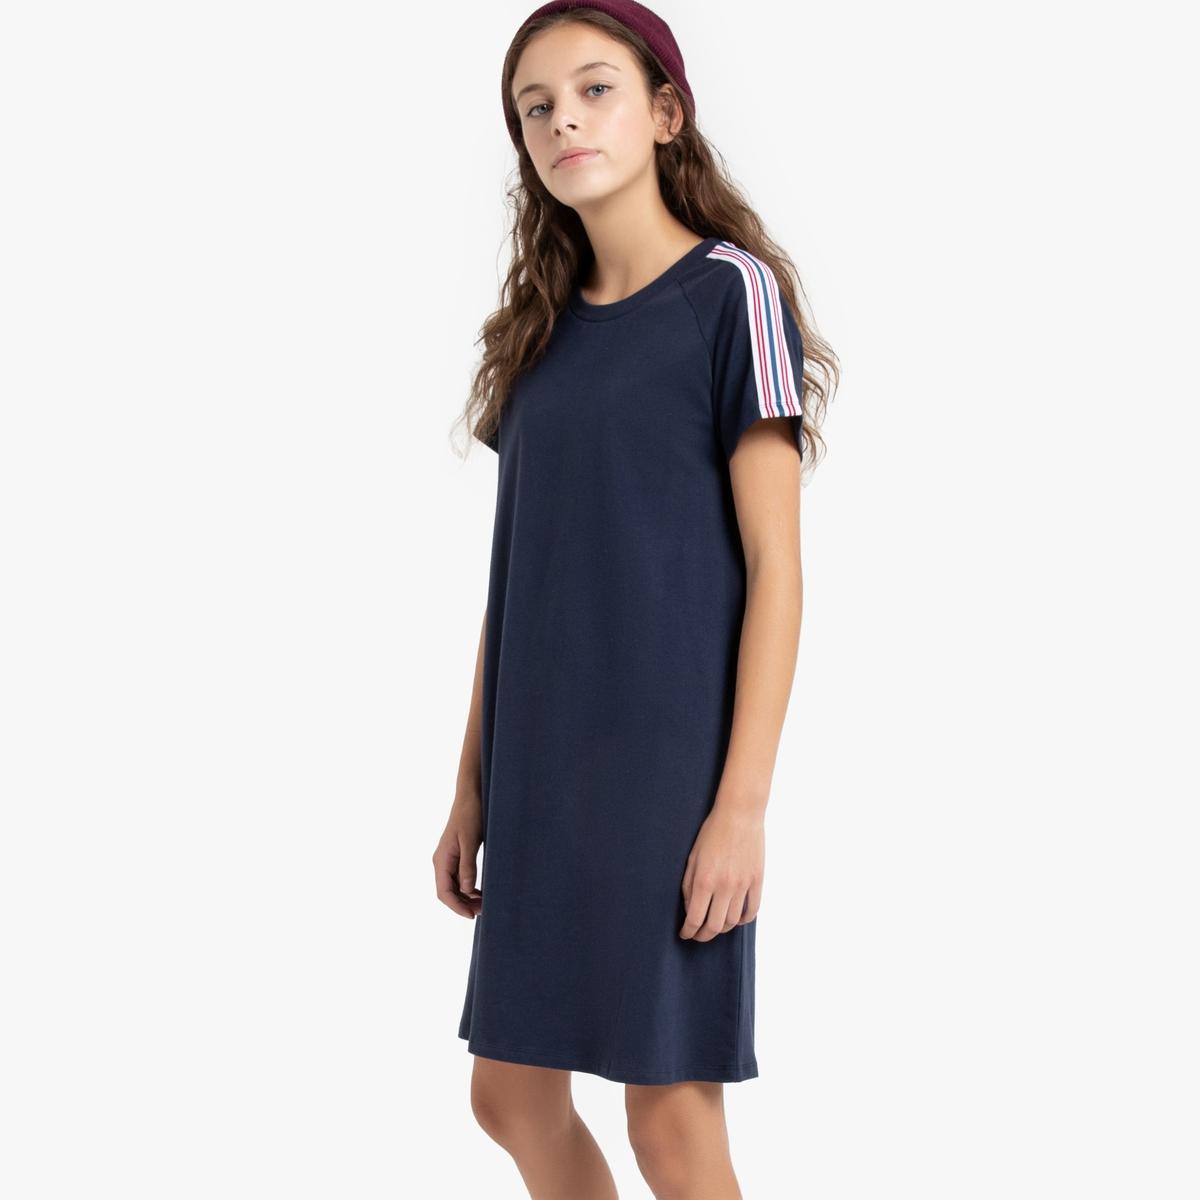 Платье-футболка La Redoute С короткими рукавами 16 лет - 162 см синий